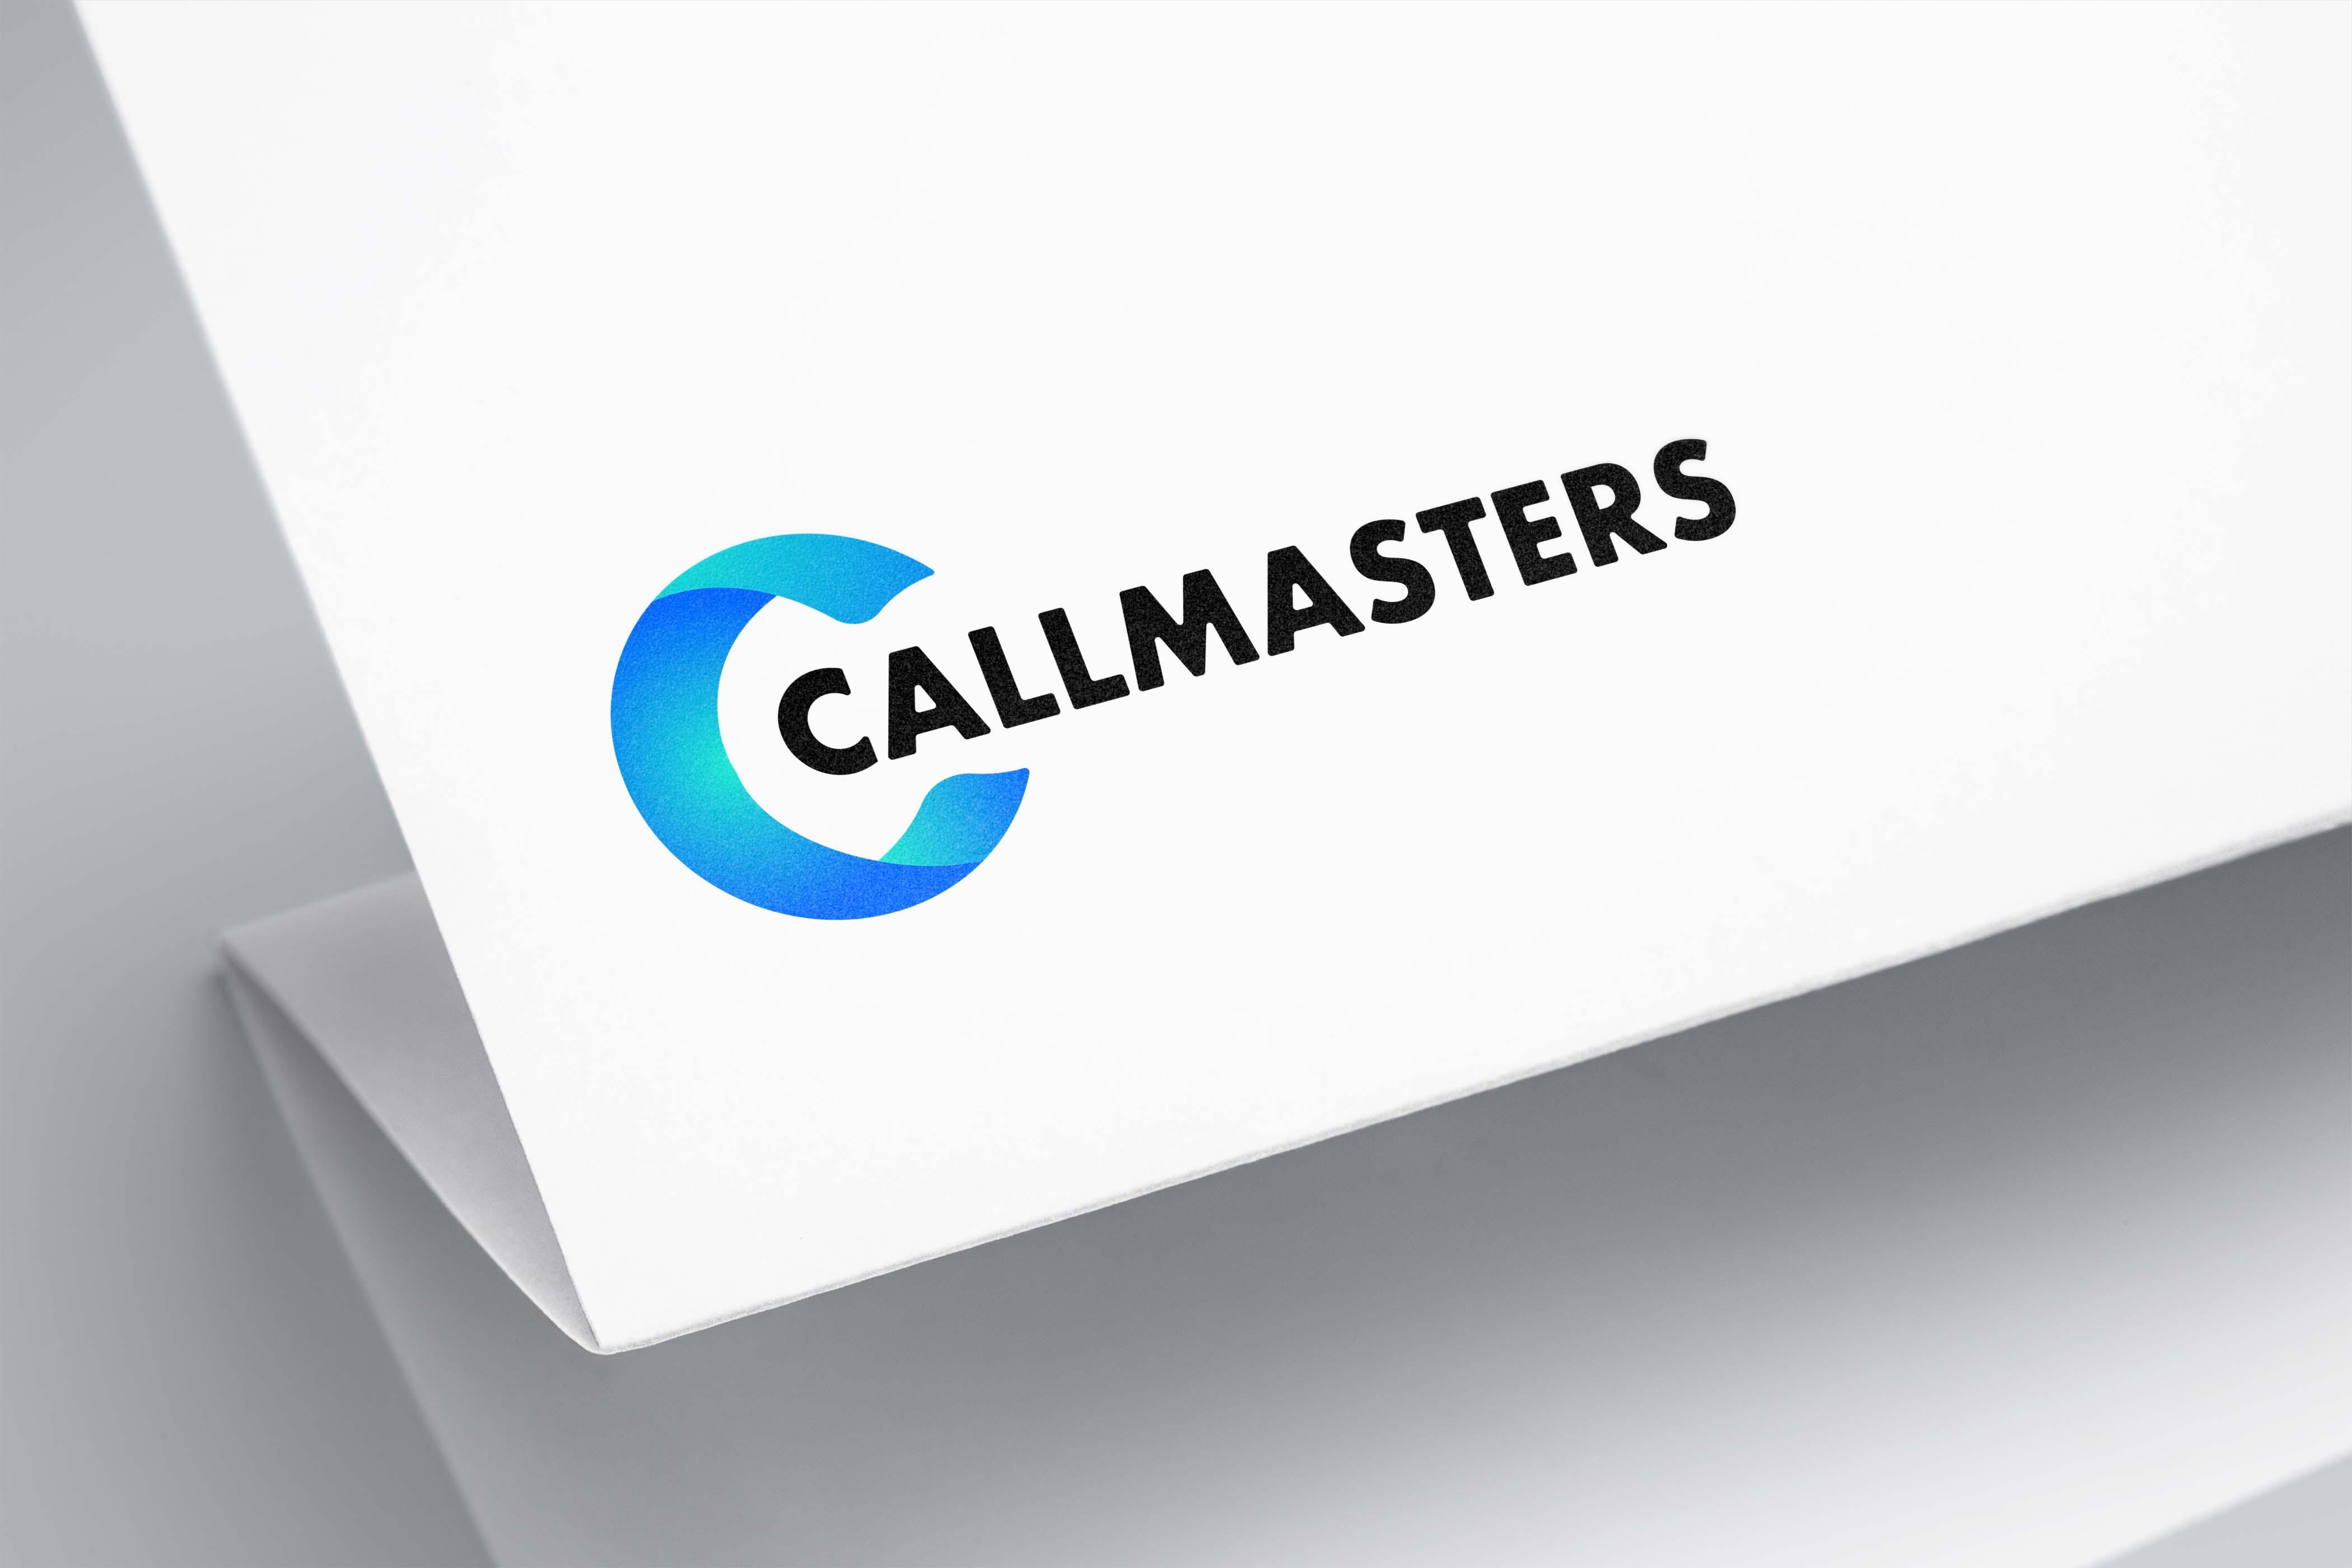 Логотип call-центра Callmasters  фото f_2645b6b7005a0444.jpg